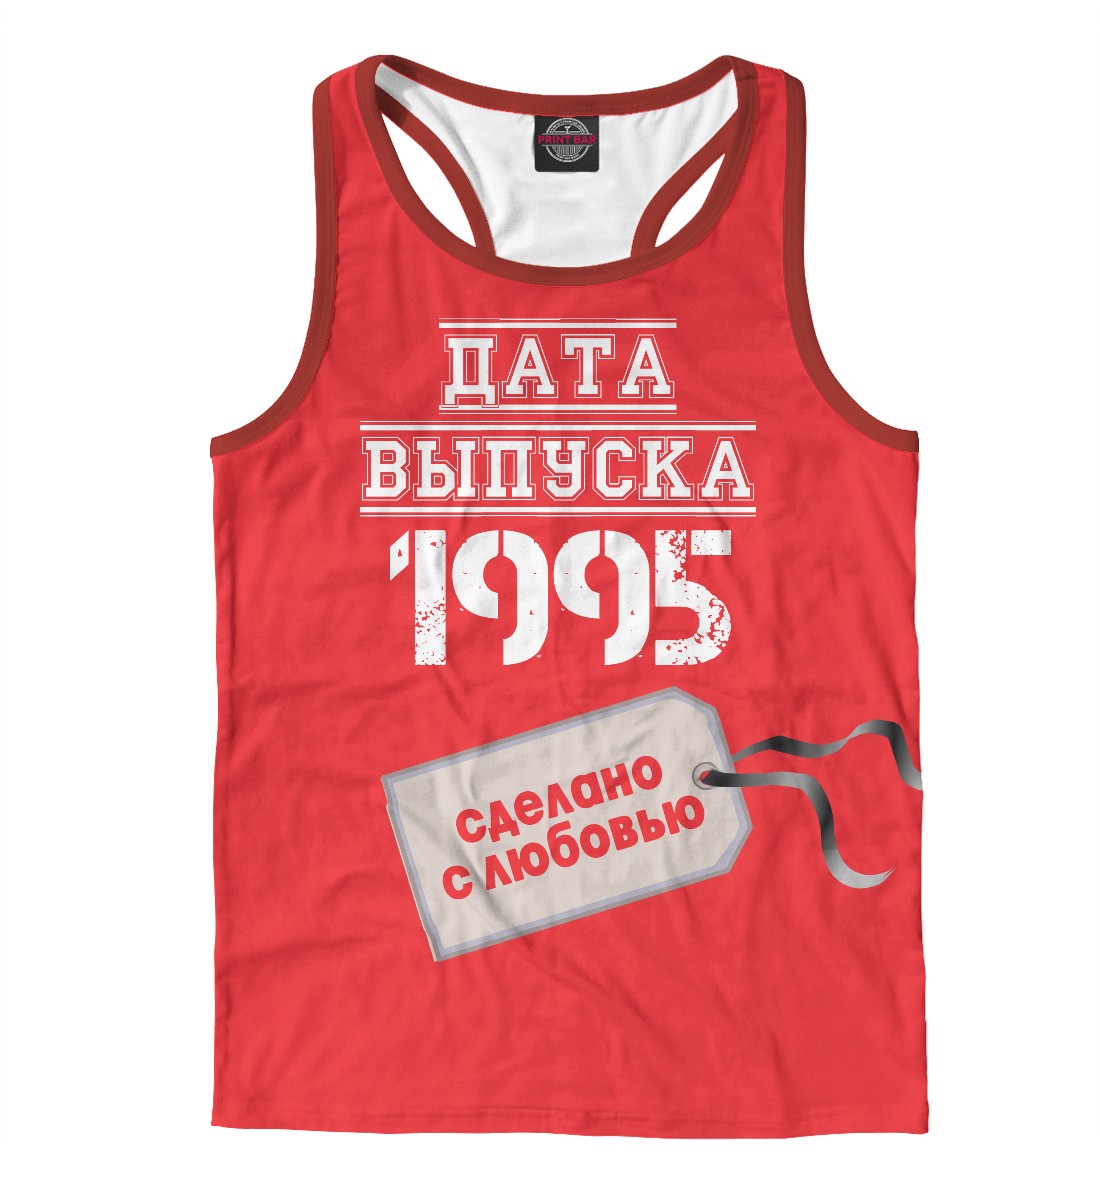 Купить Дата выпуска 1995, Printbar, Майки борцовки, DDP-200178-mayb-2